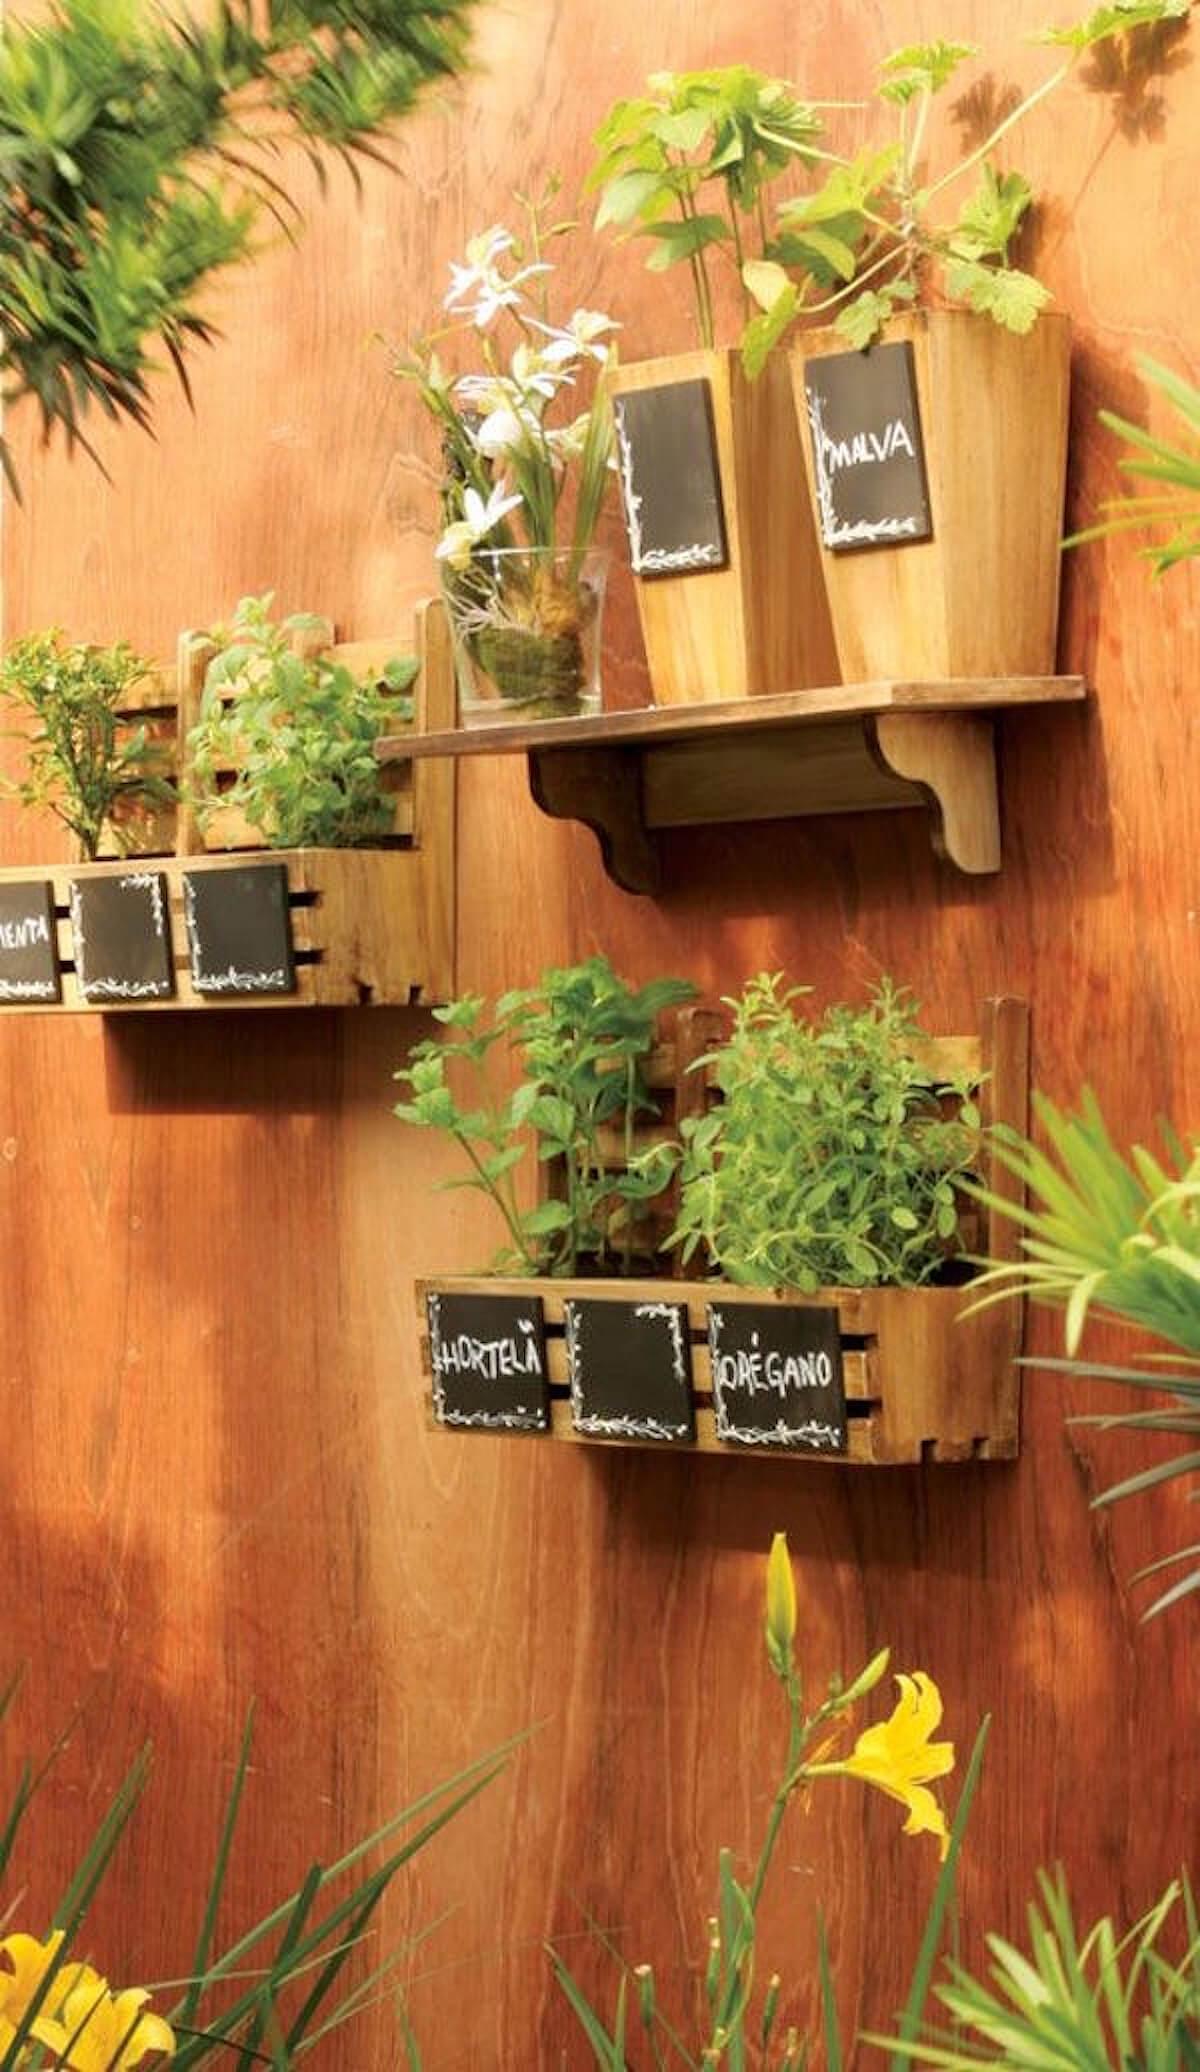 Decorative Wooden Box and Vase Herb Garden